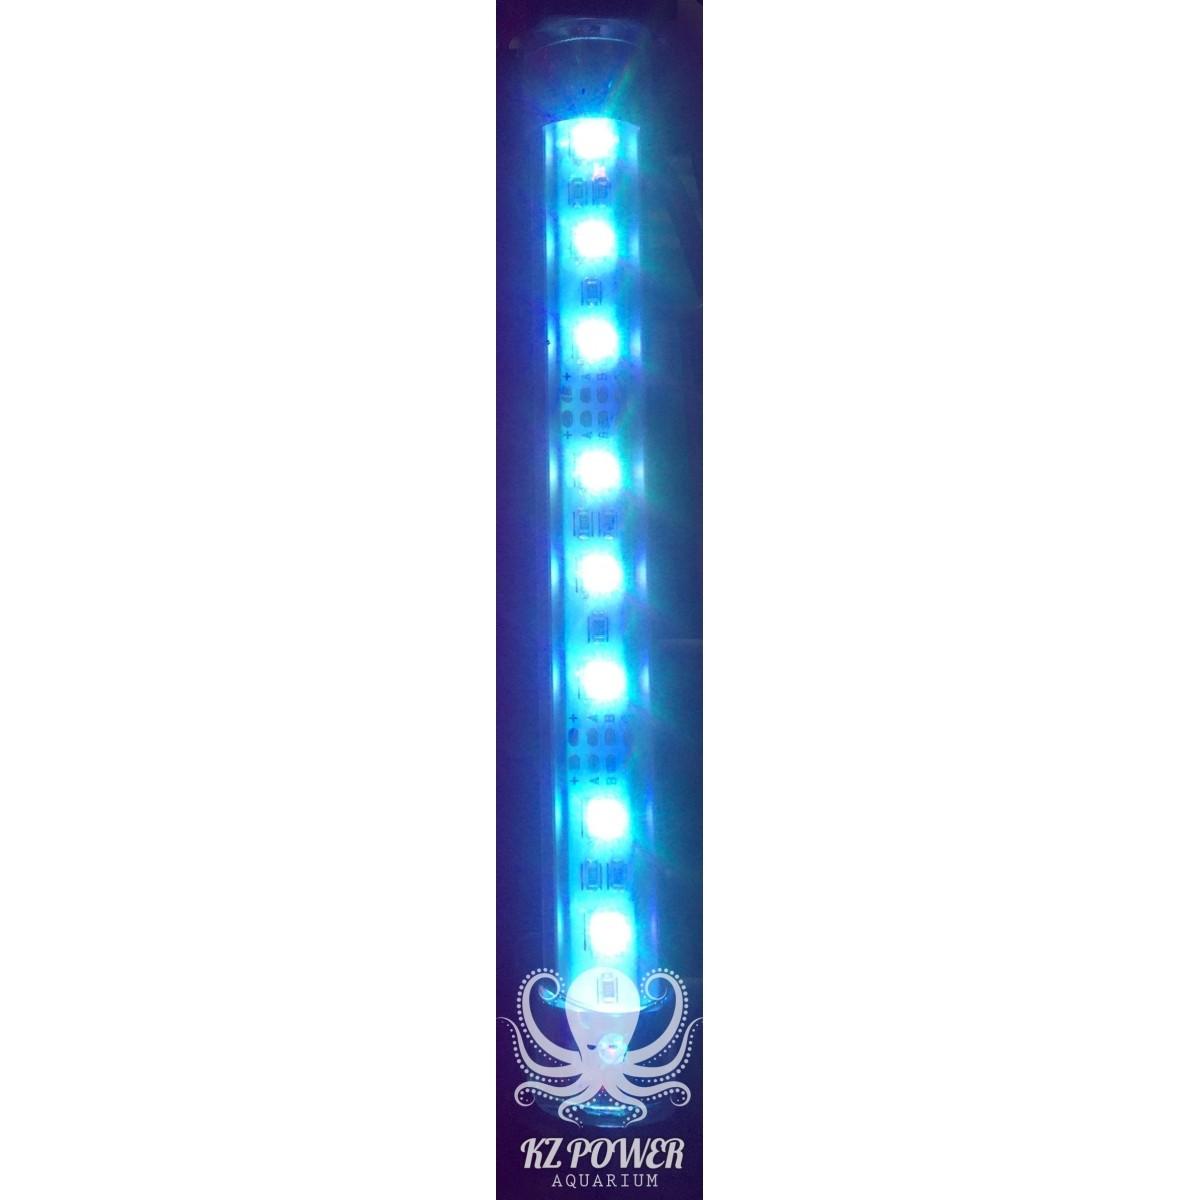 Luminaria Led Aqualumi RGB 30cm + Fonte Bivolt  - KZ Power